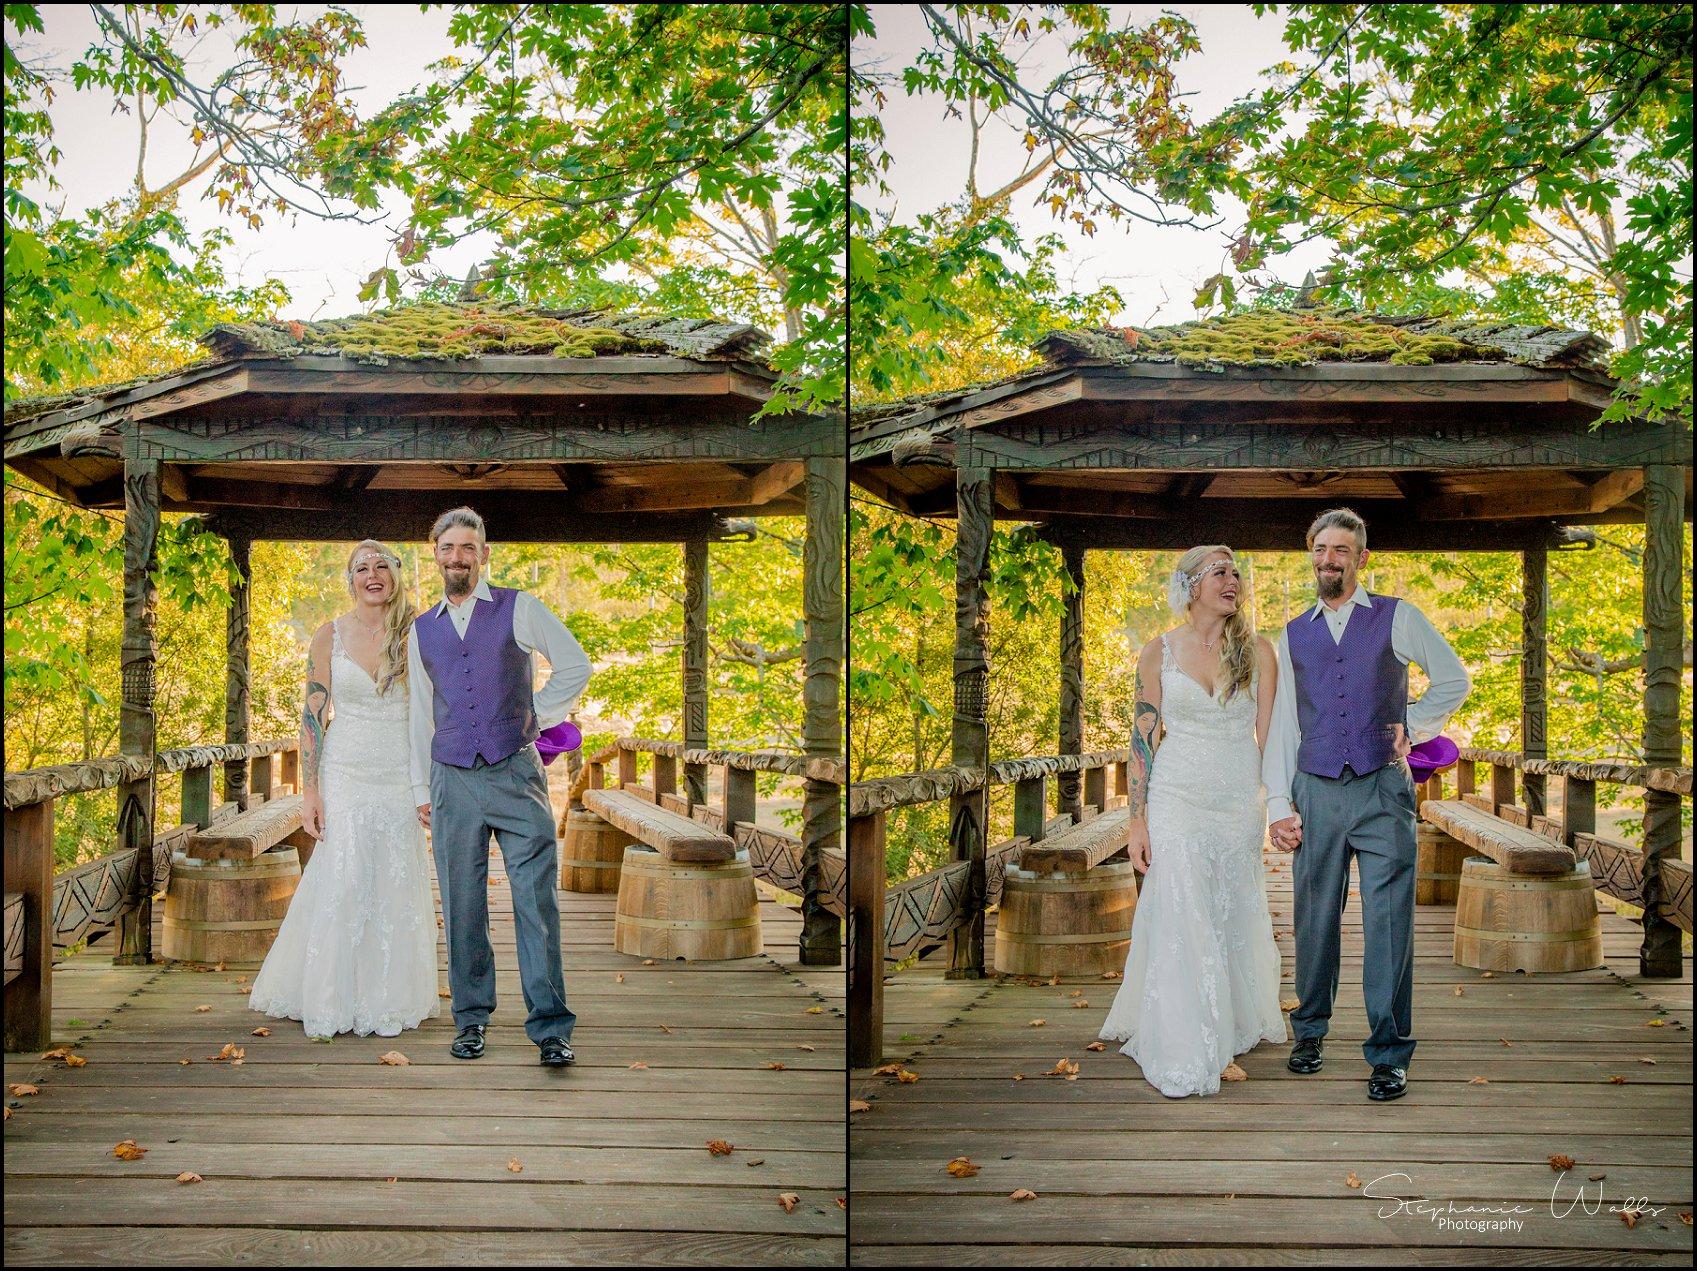 Everist Wedding 051 1 Patti & Bobbys | Troll Haven Castle & Bandy Farms | Sequim, Wa Wedding Photographer